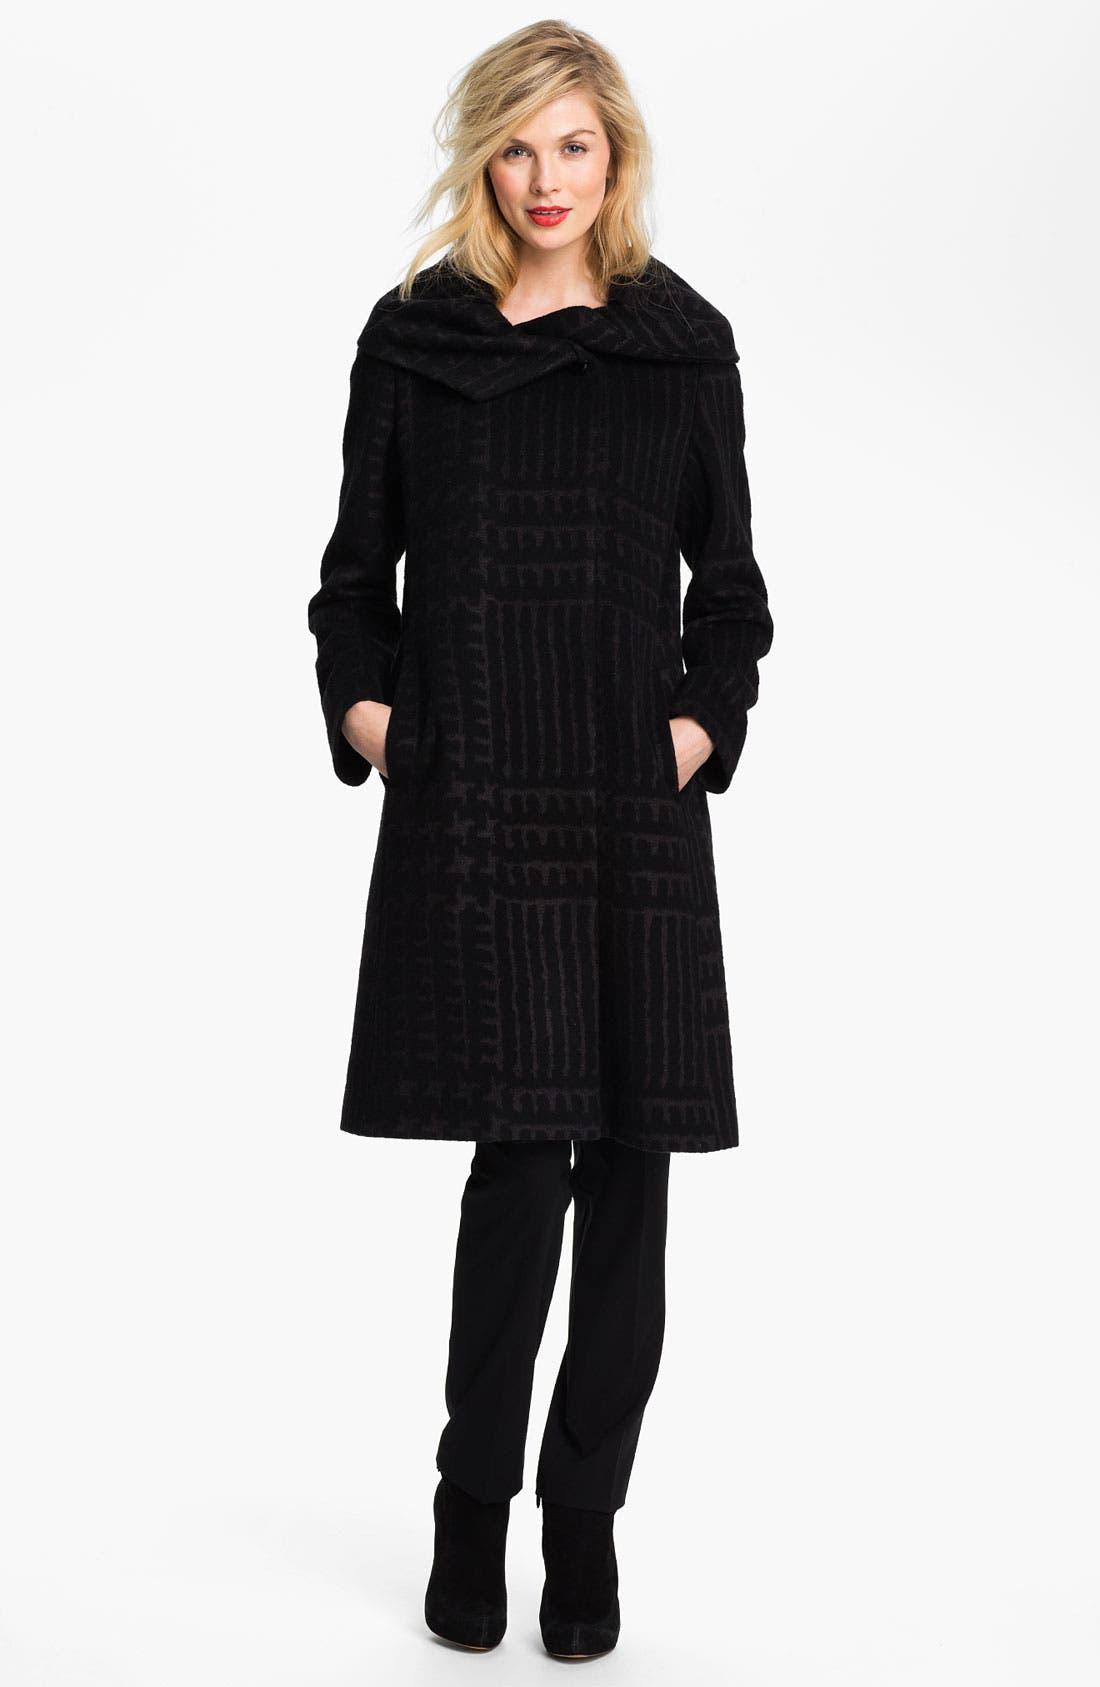 Alternate Image 1 Selected - Cinzia Rocca Patterned Wool Blend Coat